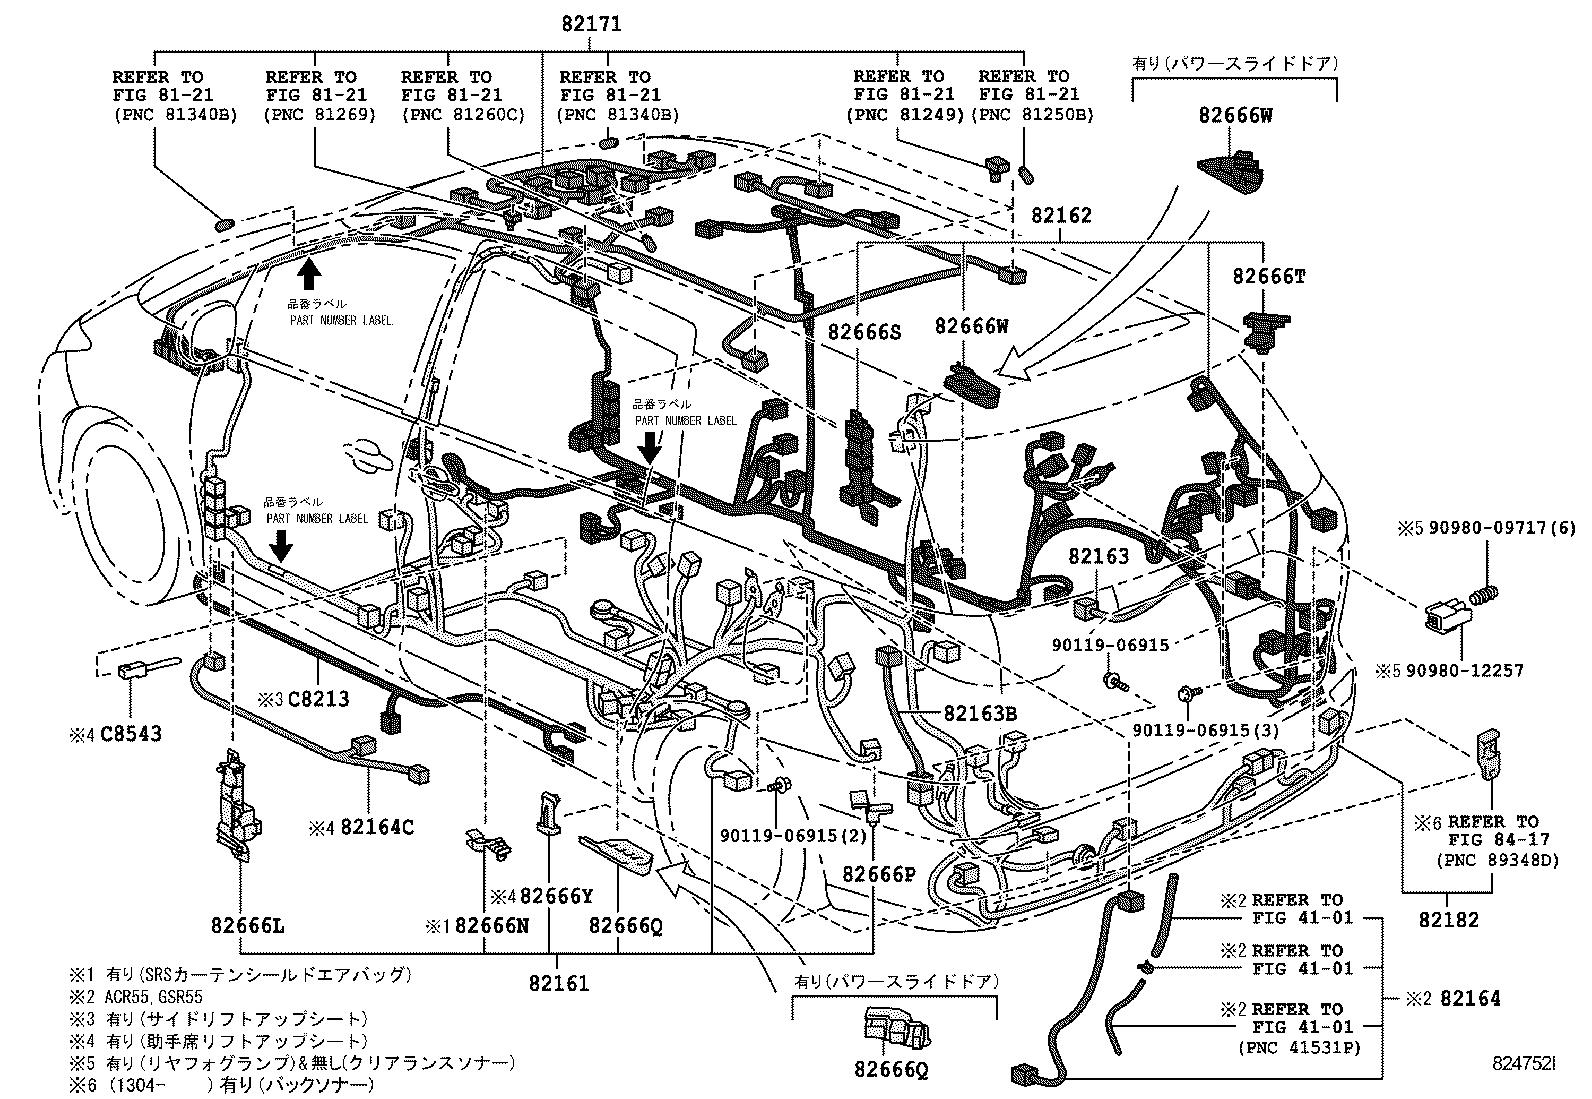 [DIAGRAM] Toyota Estima Wiring Diagram FULL Version HD